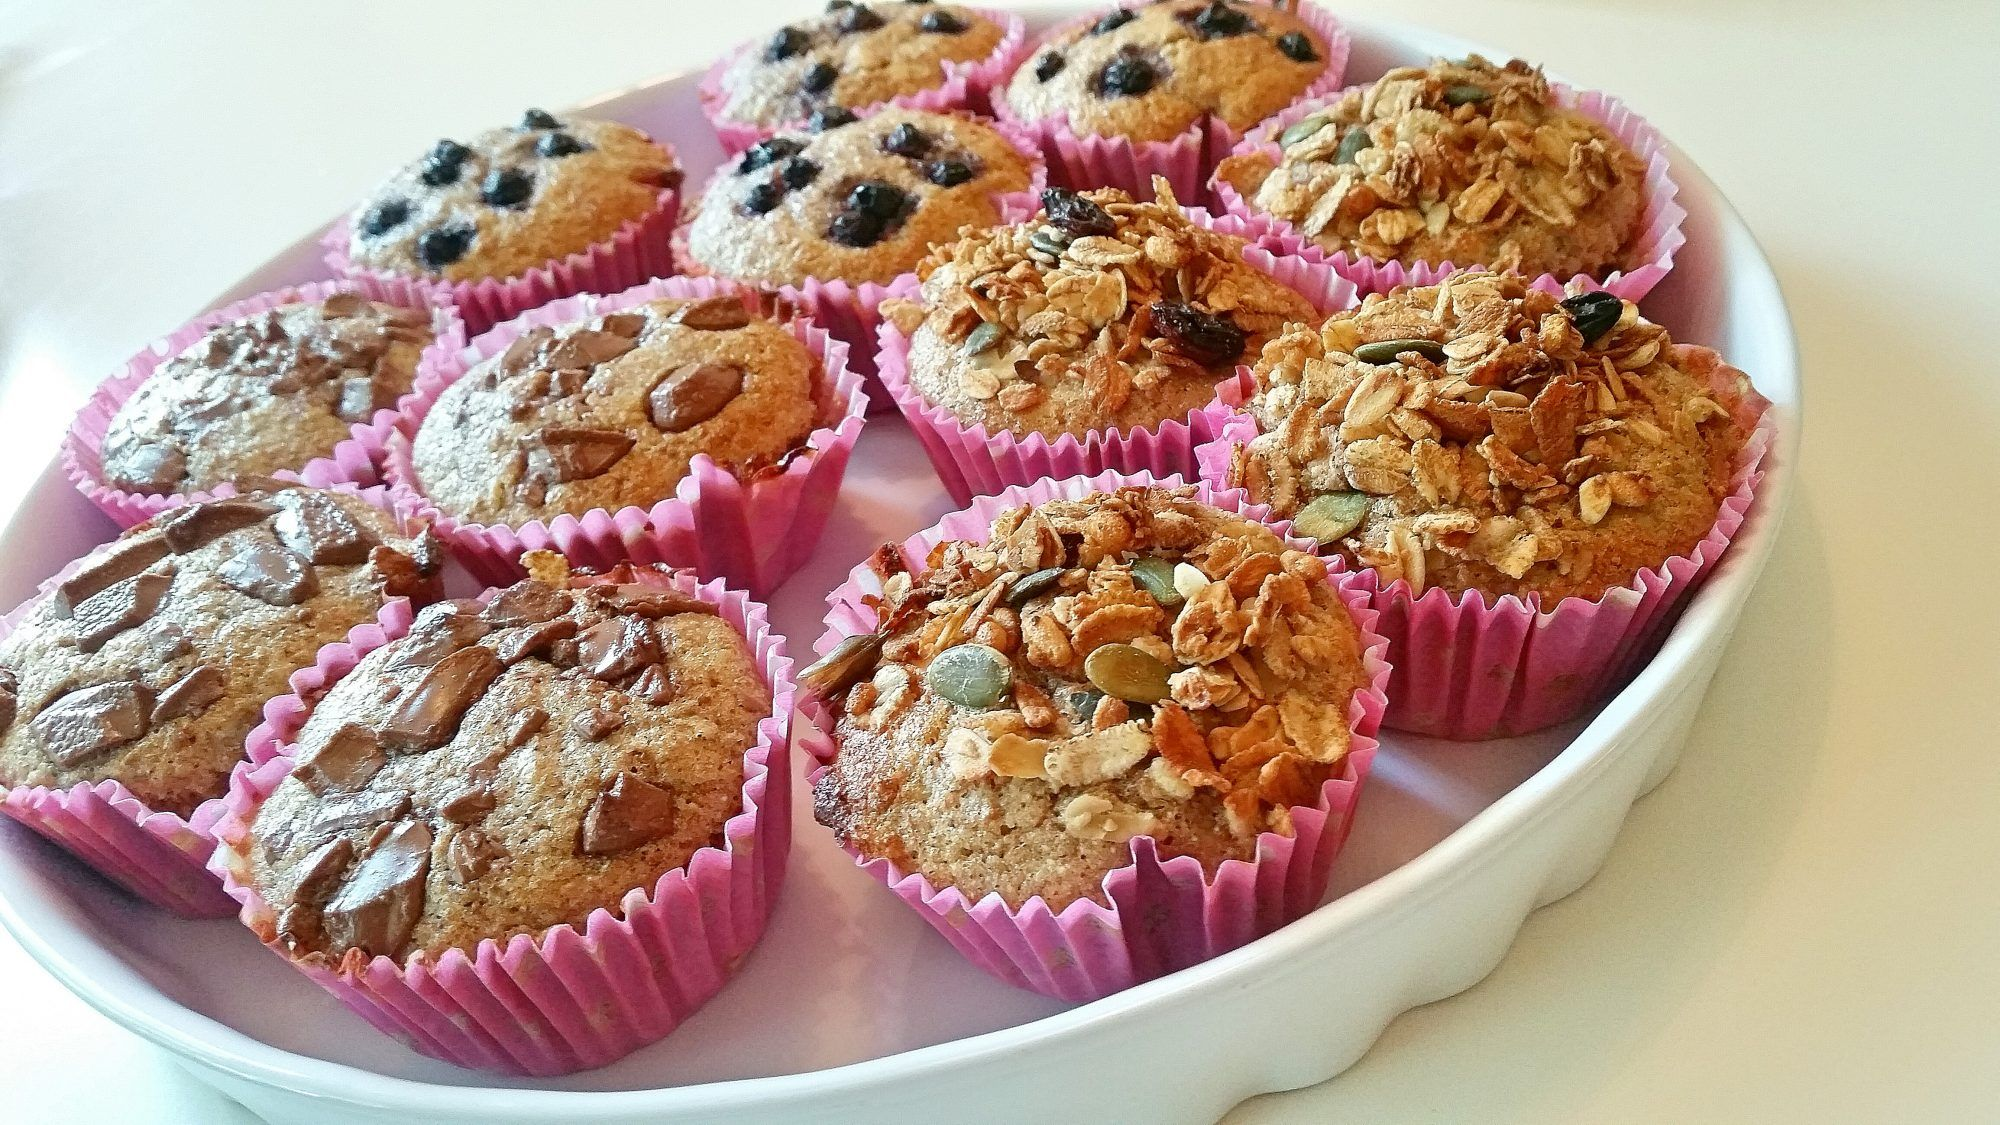 muffins utan mjölk